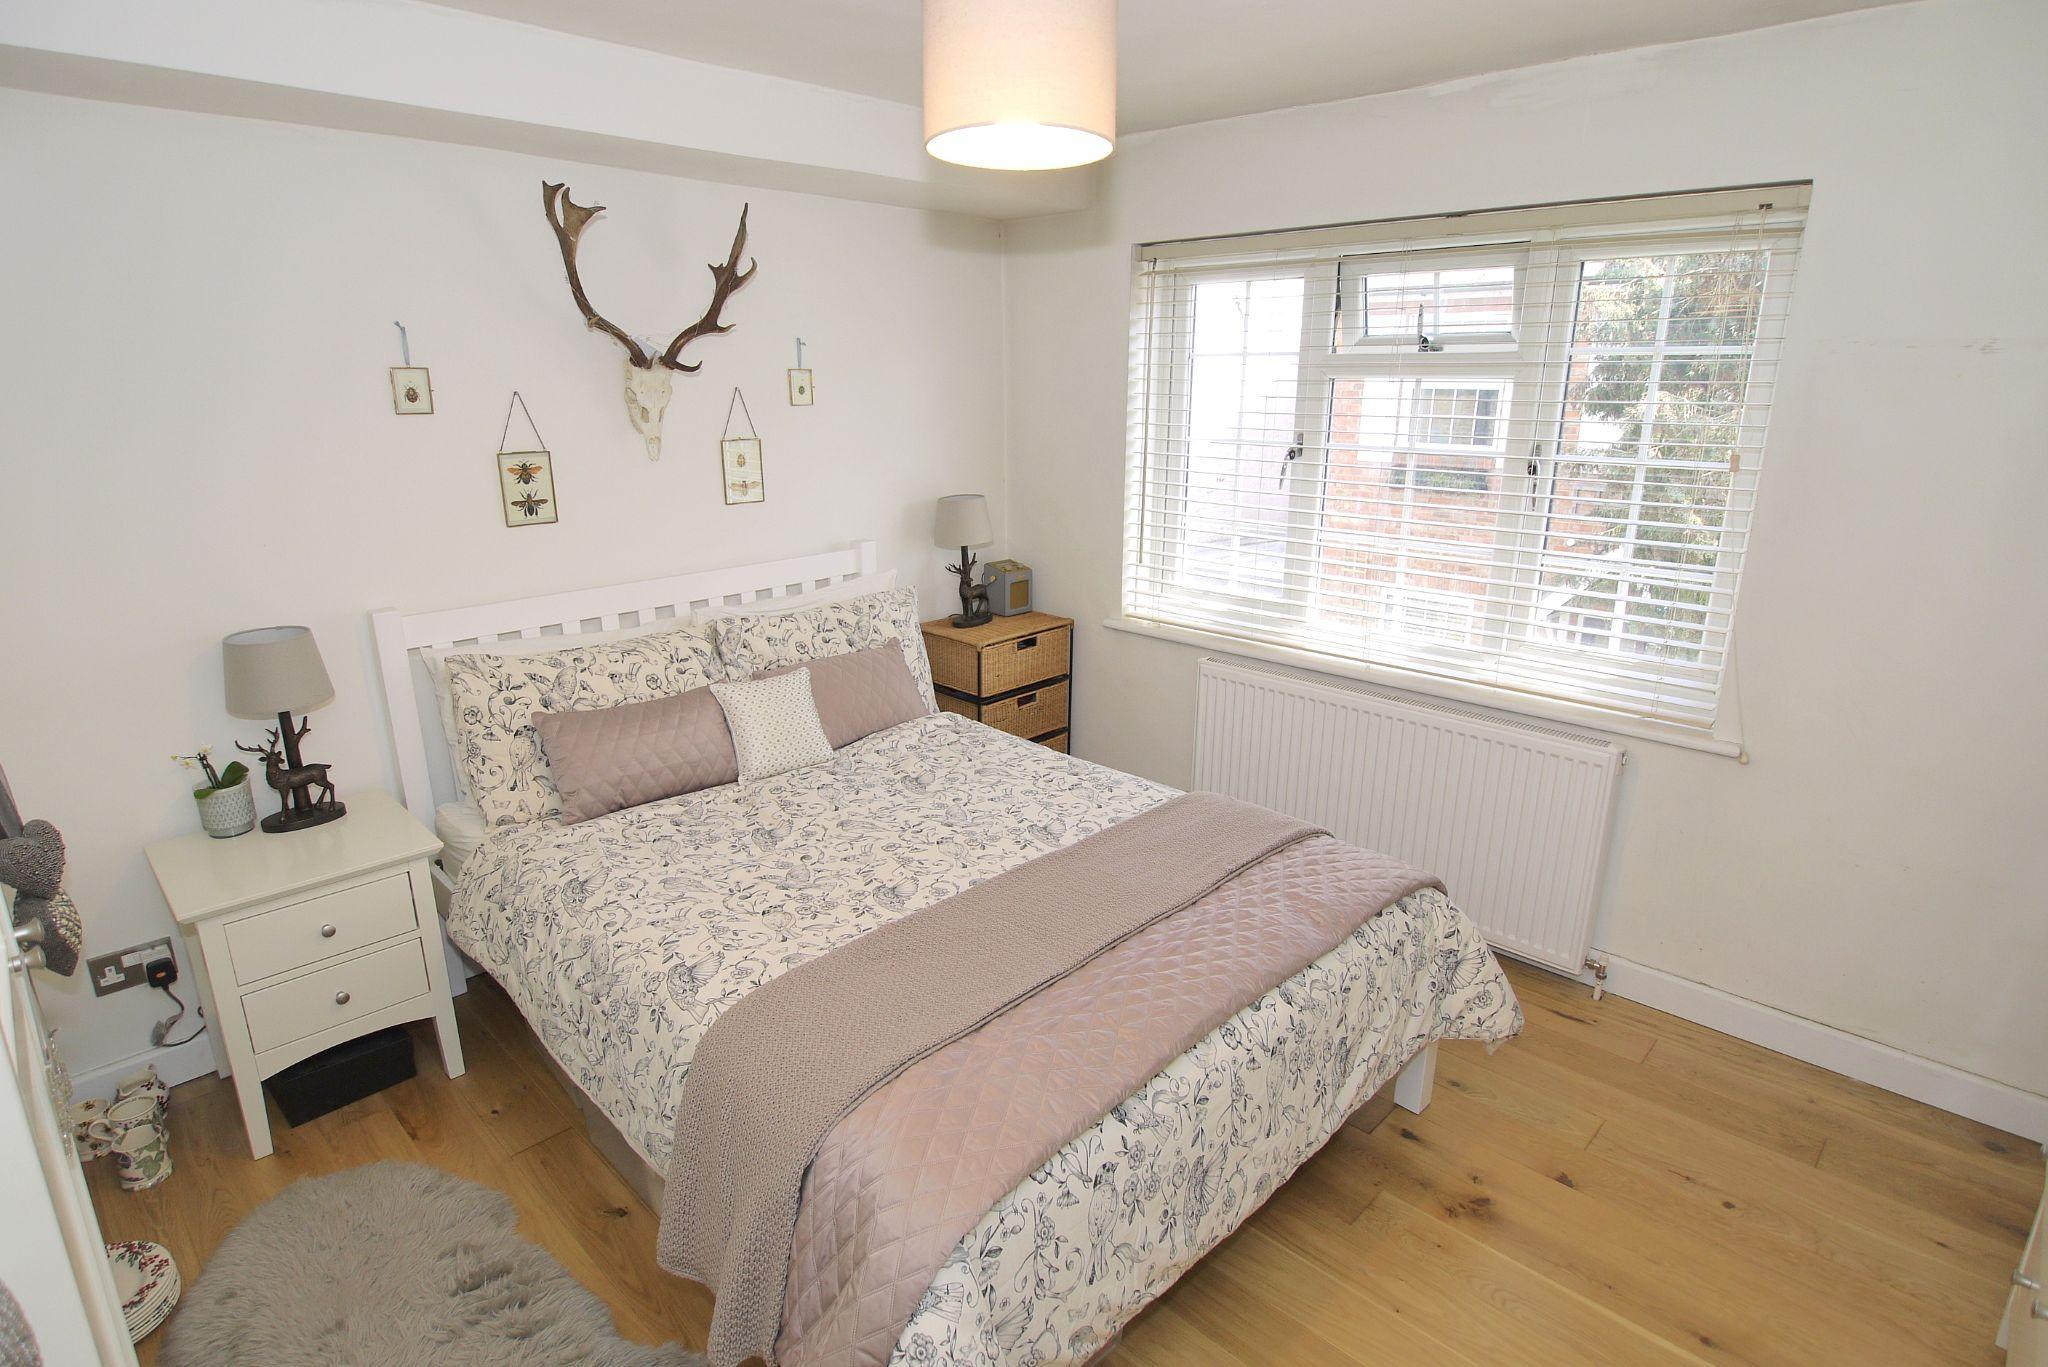 1 bedroom mid terraced house Sold in Sevenoaks - Photograph 6